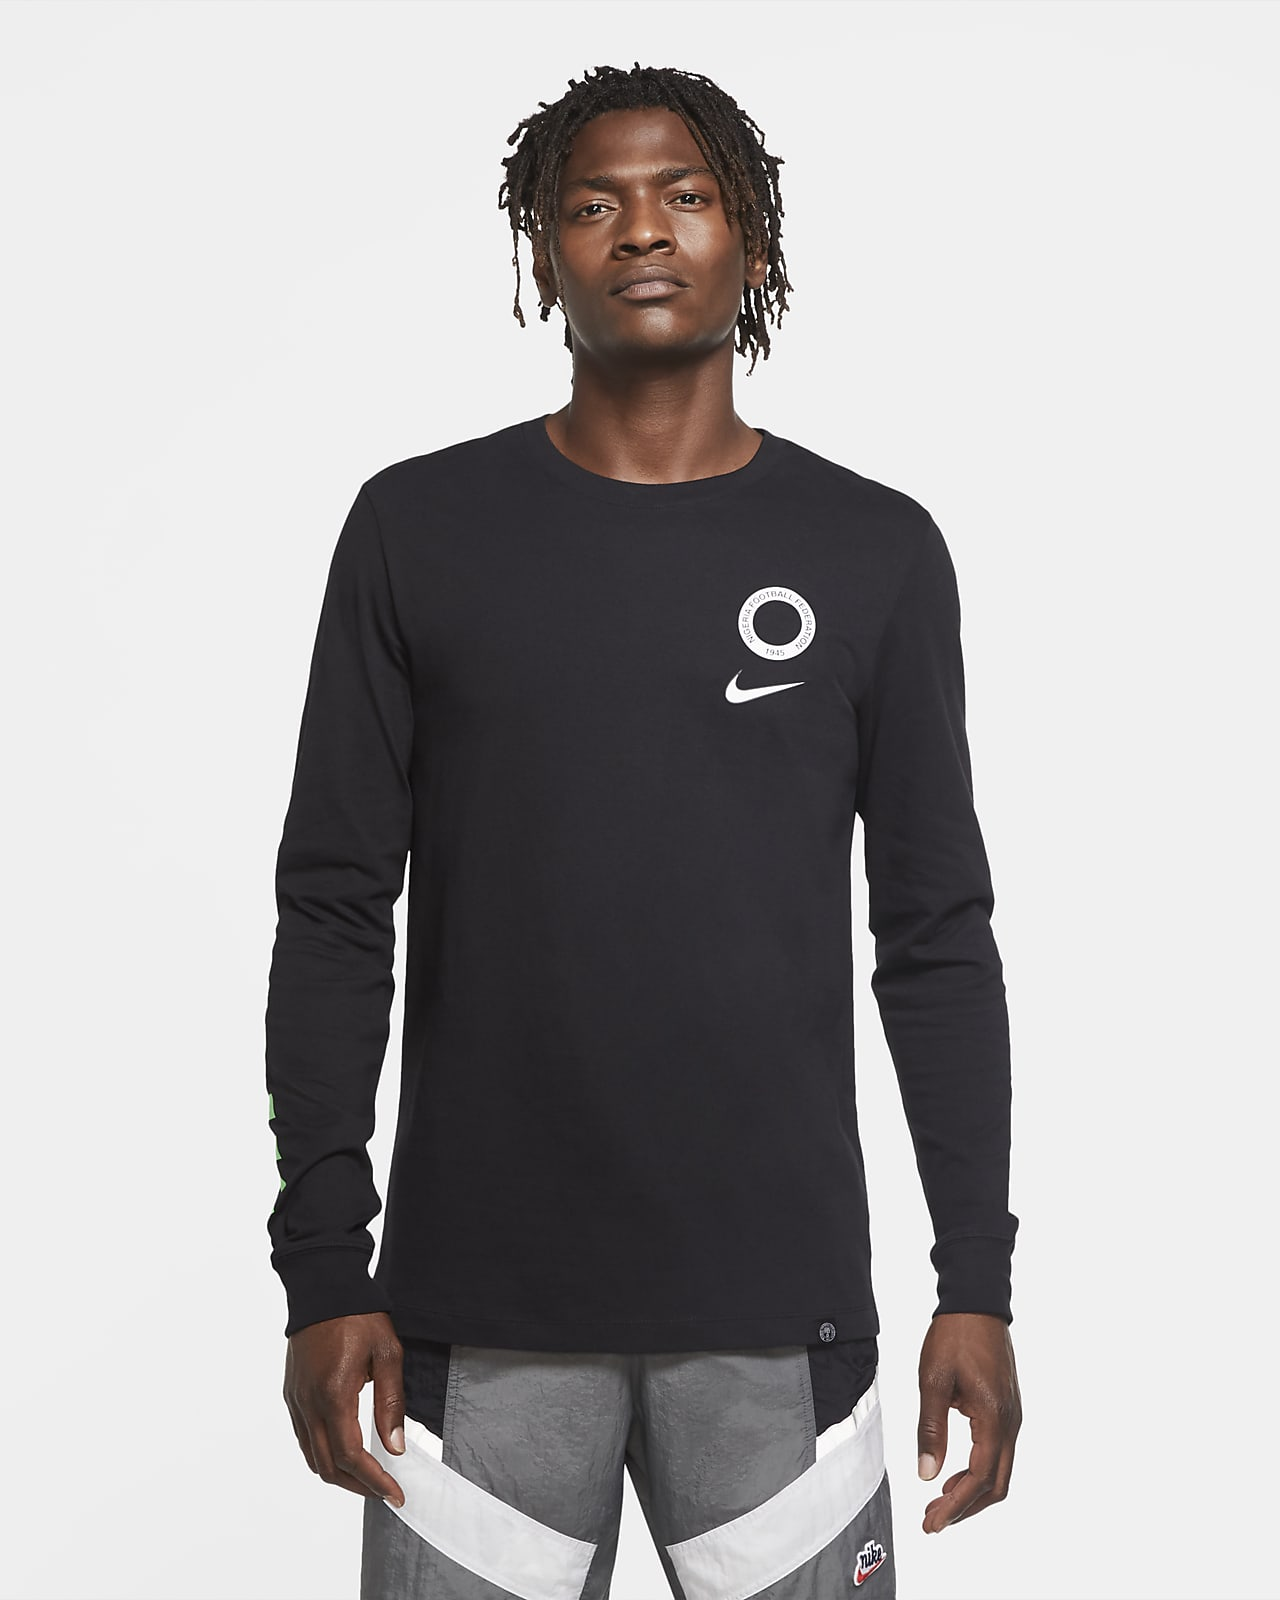 Nigeria Men's Long-Sleeve Football T-Shirt